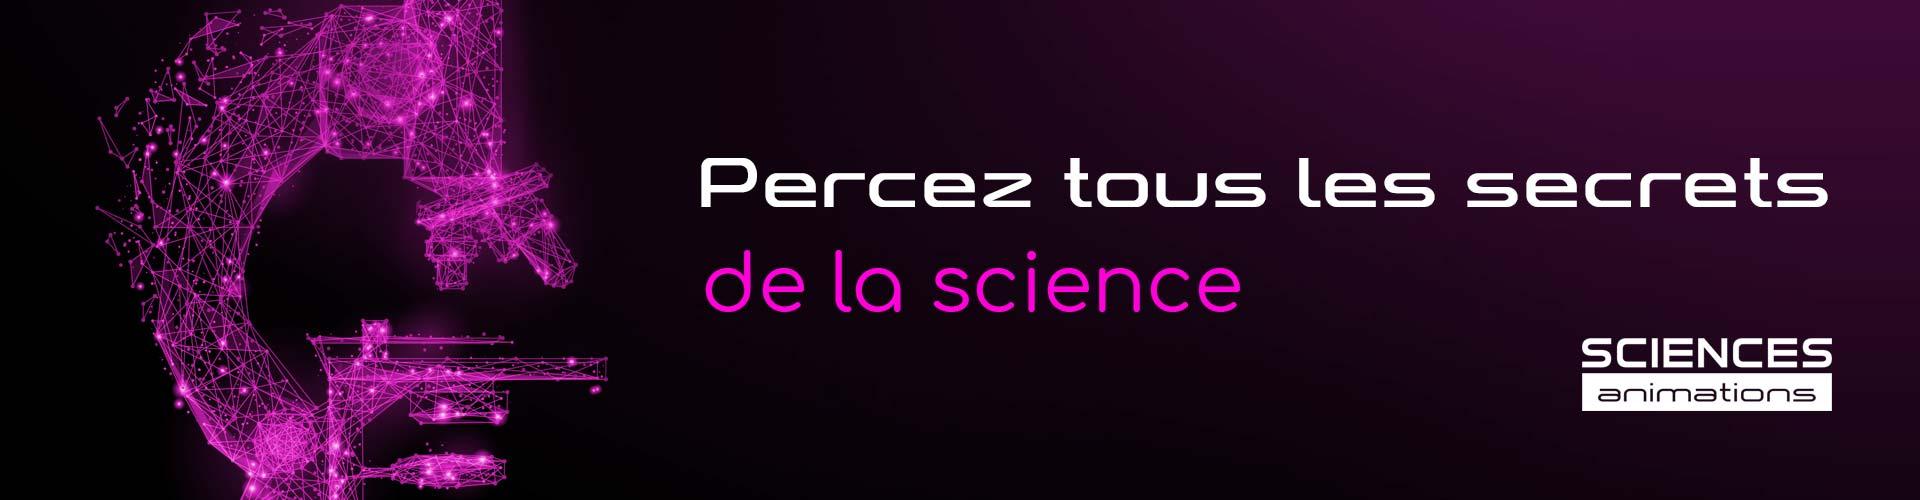 Secrets de la science